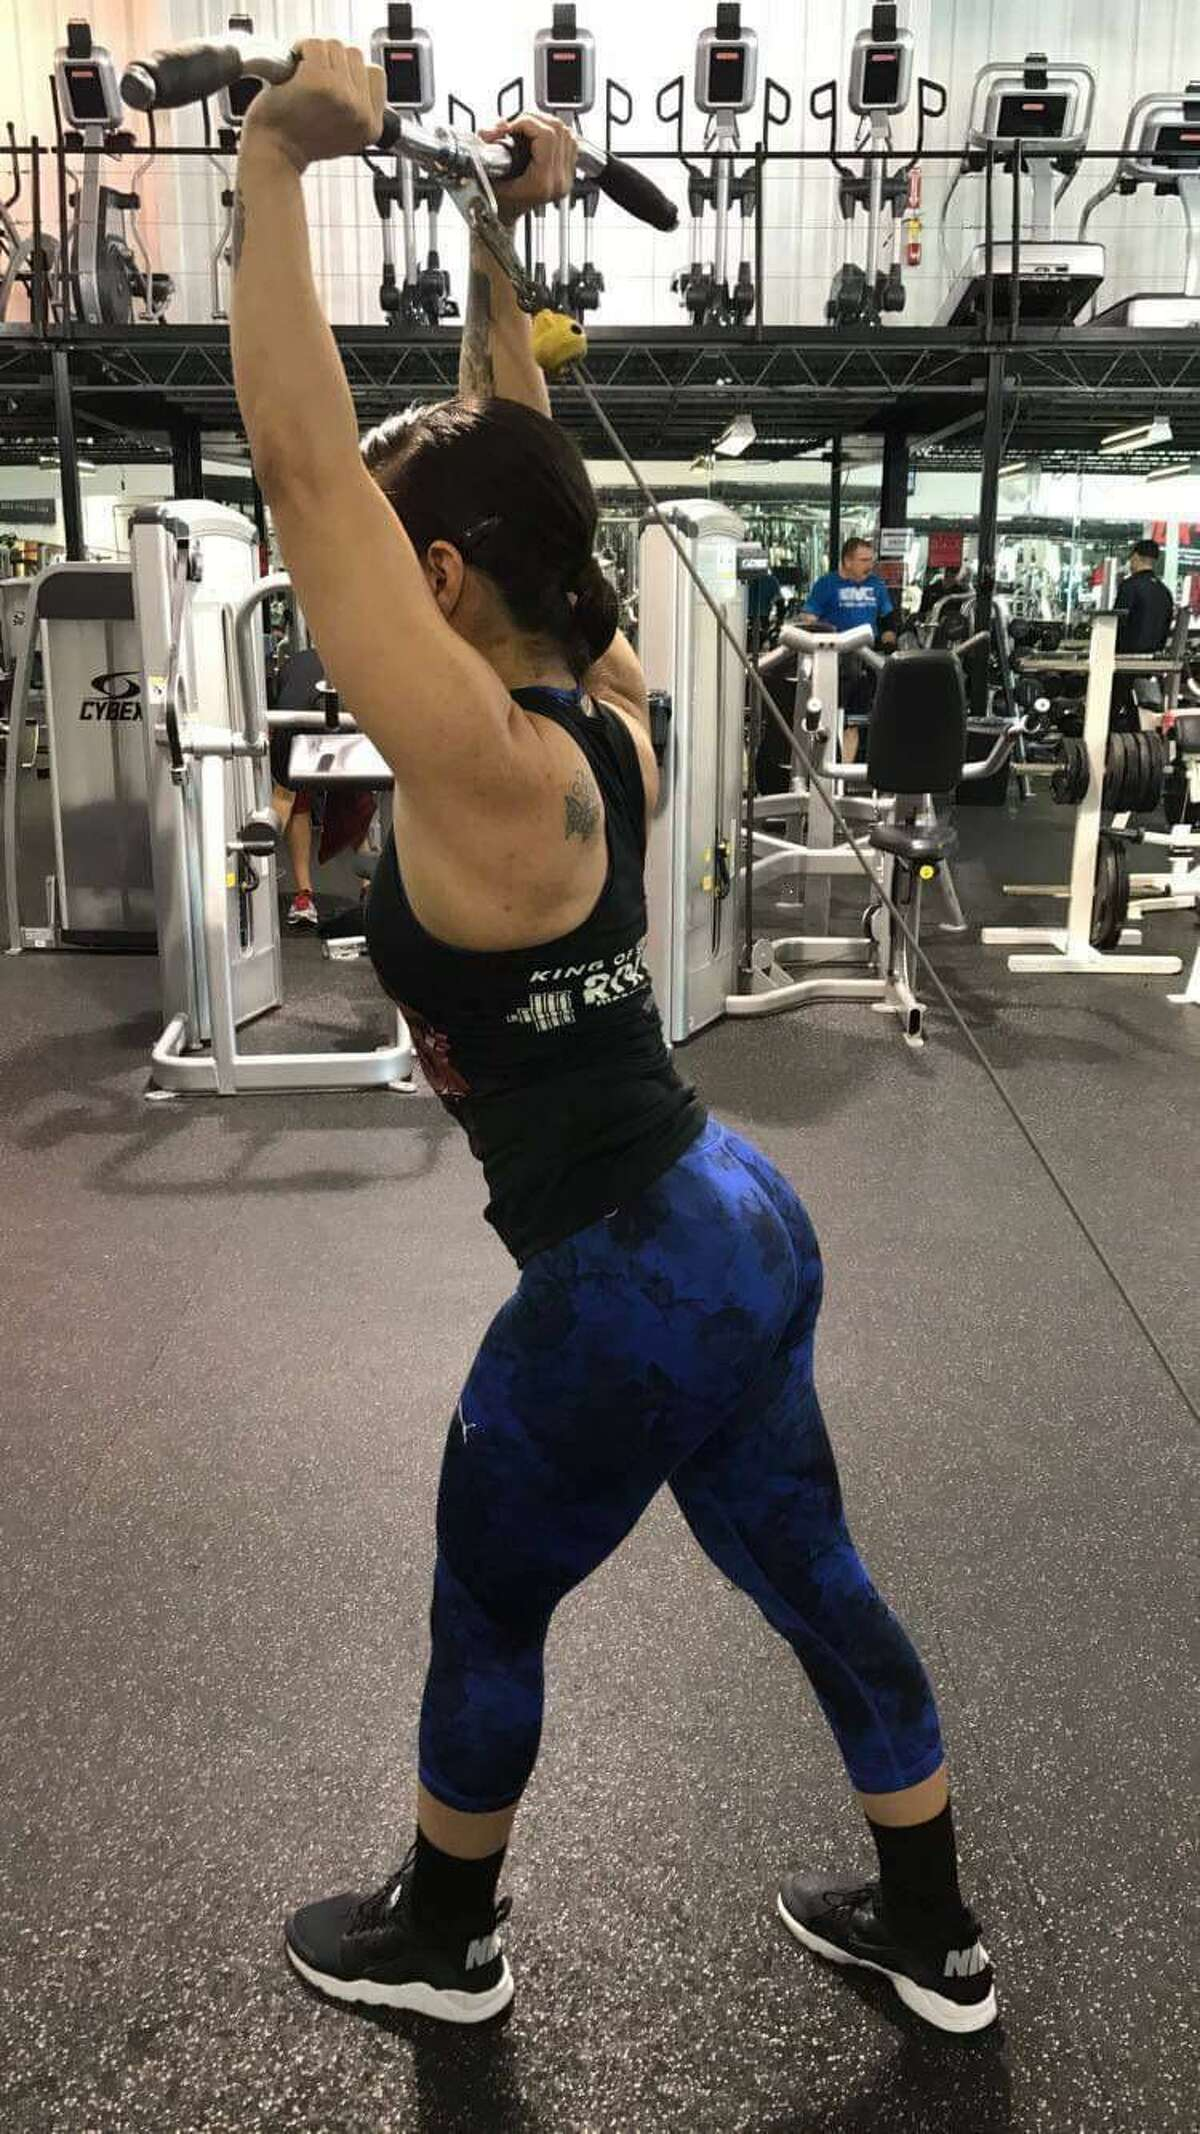 Mandy at Rock Fitness